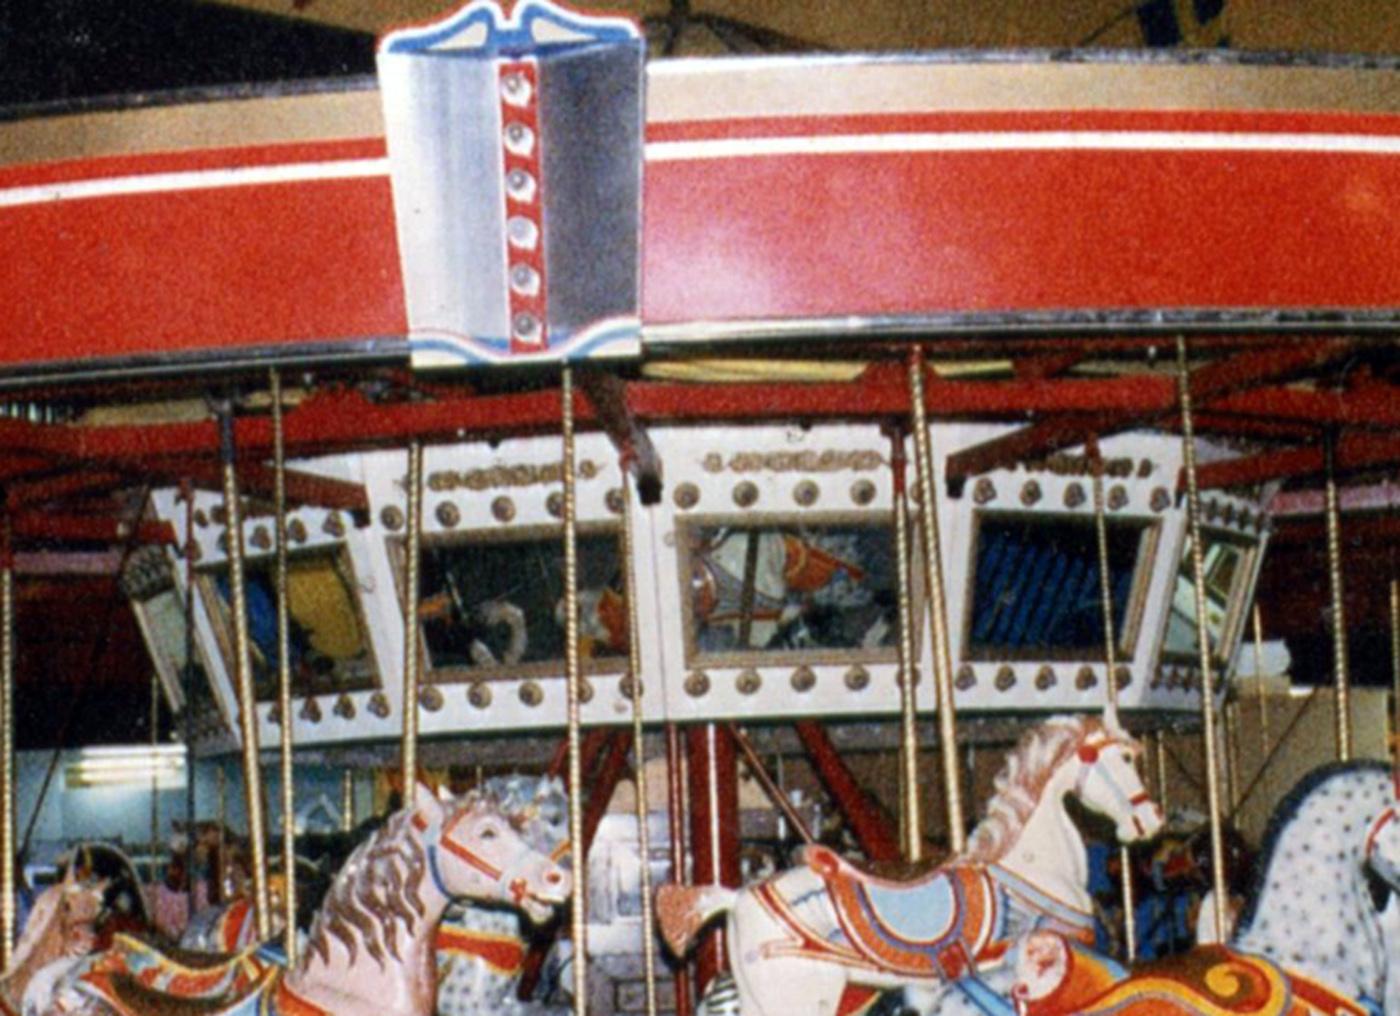 Skylon Towers Carousel Mechanism